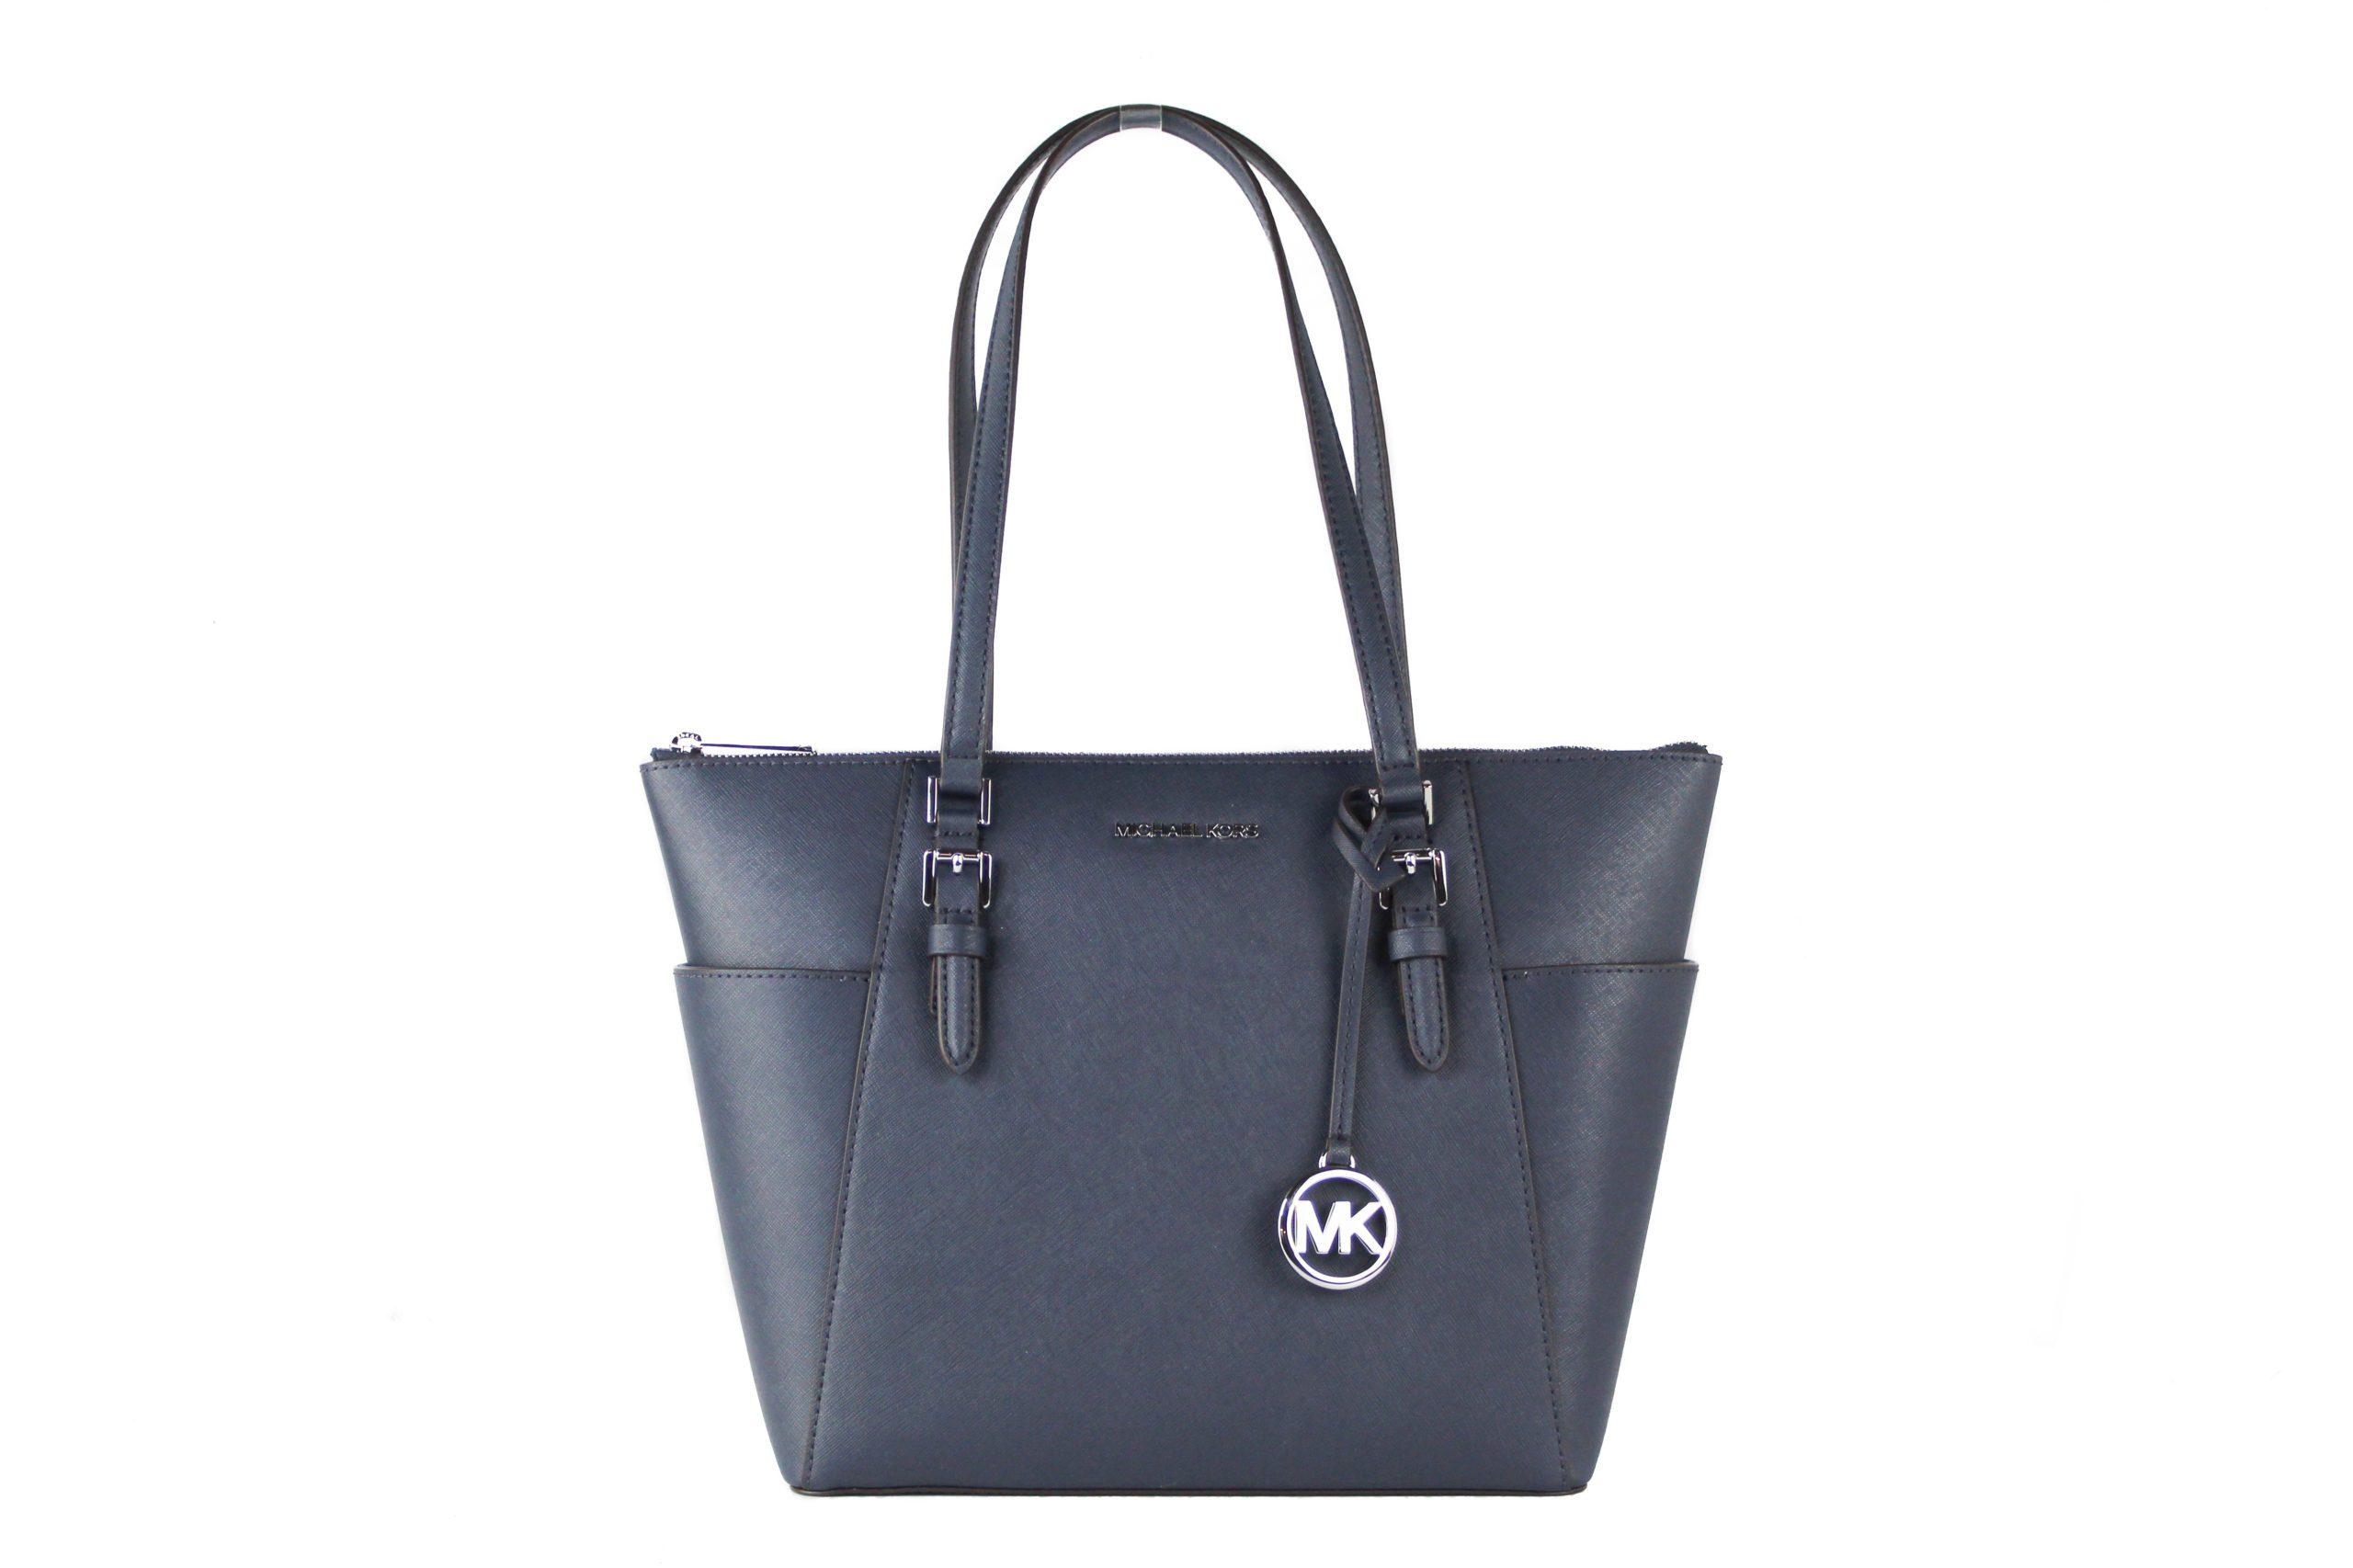 Michael Kors Women's Charlotte Tote Bag Blue 60739